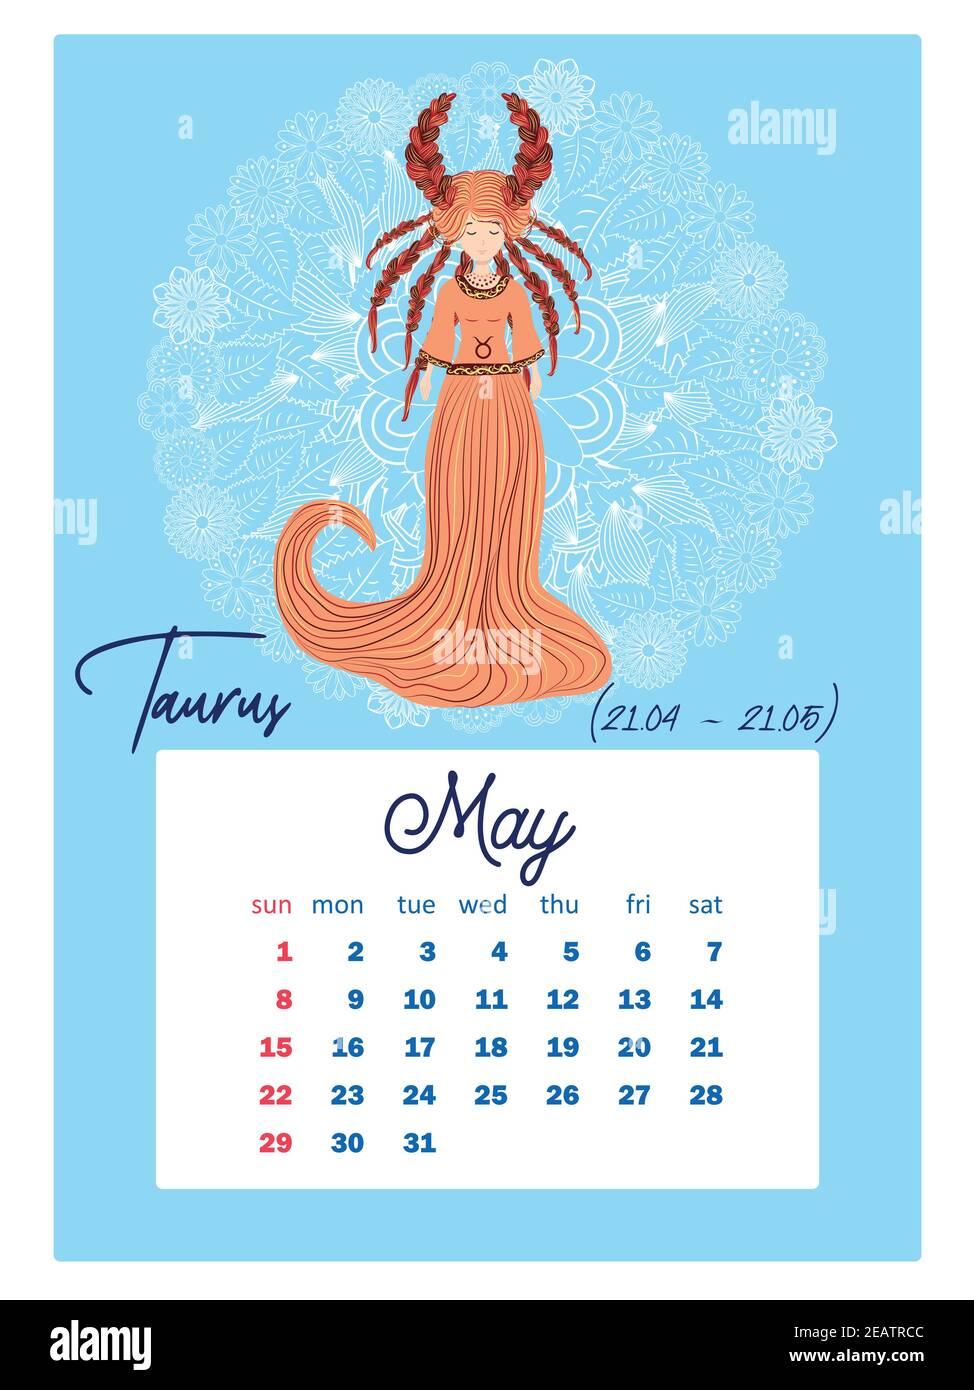 Zodiac Calendar 2022.Horoscope Vertical Calendar For 2022 With Female Zodiac Signs Week Starts On Sunday A4 Format Zodiac Signs Capricorn Aquarius Aries Pisces Vir Stock Vector Image Art Alamy